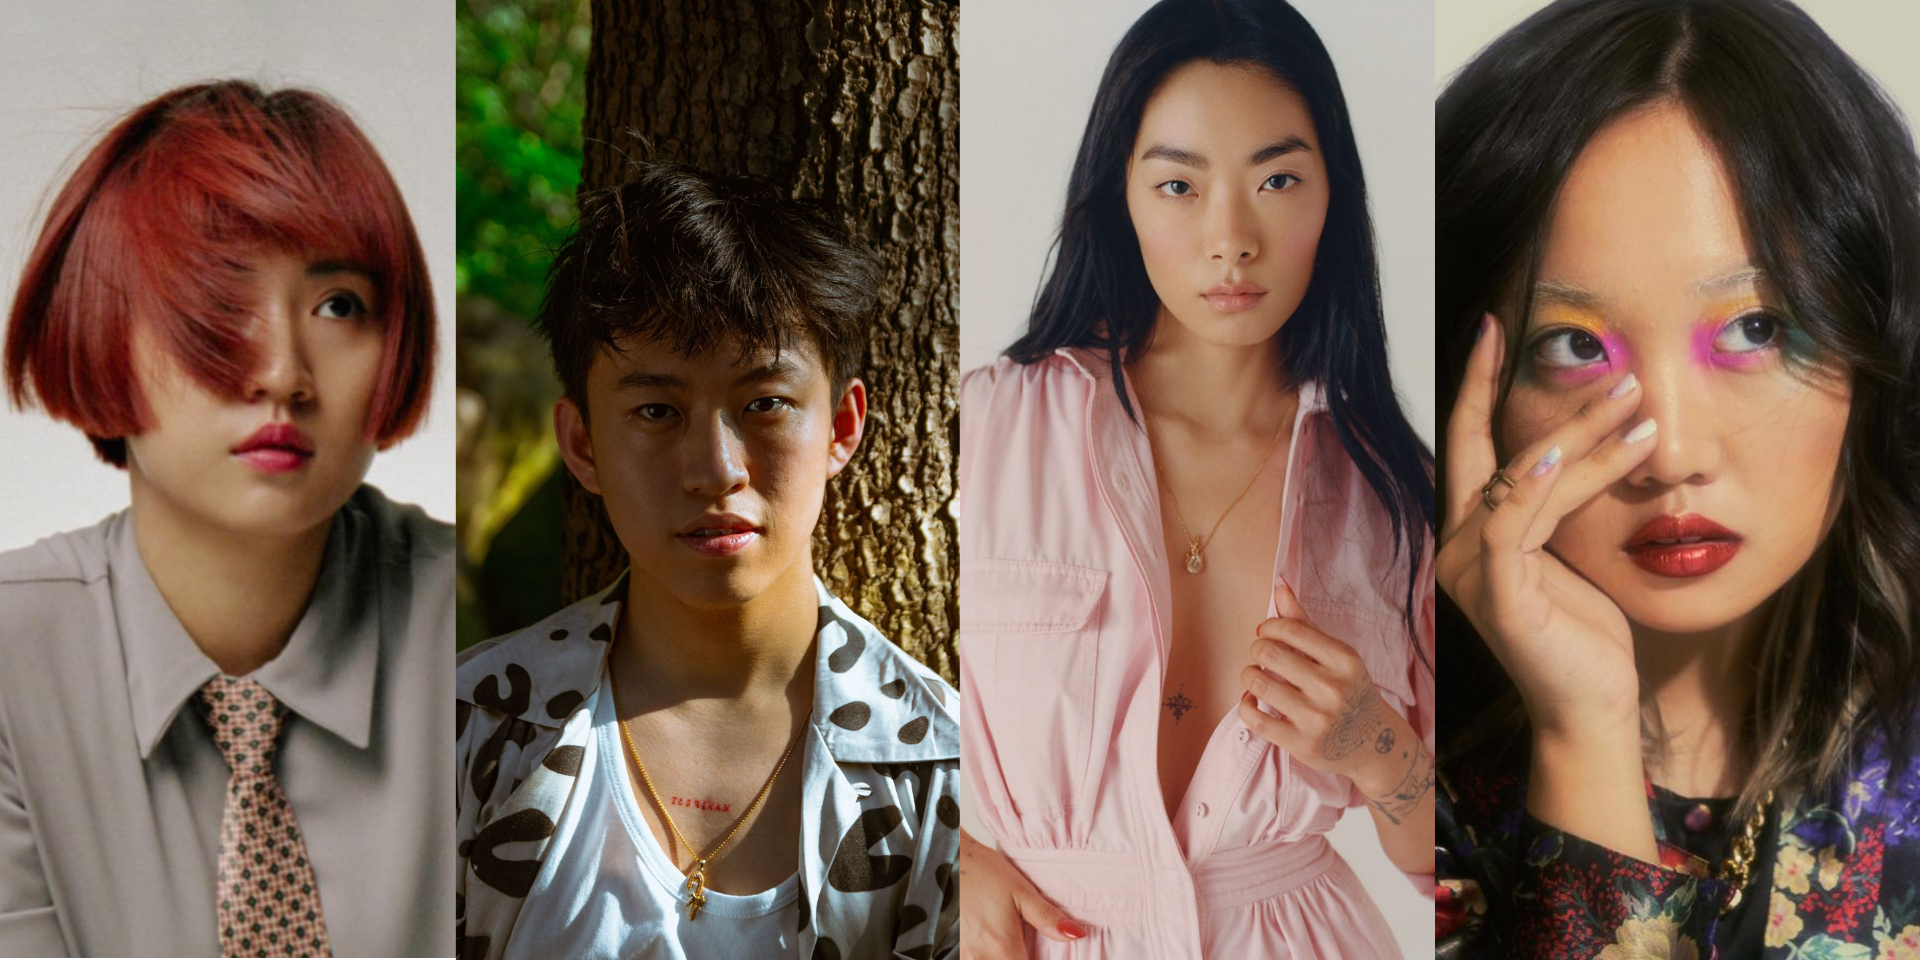 9m88, Rich Brian, Rina Sawayama, ena mori, and more are nominated at the 11th Golden Indie Music Awards